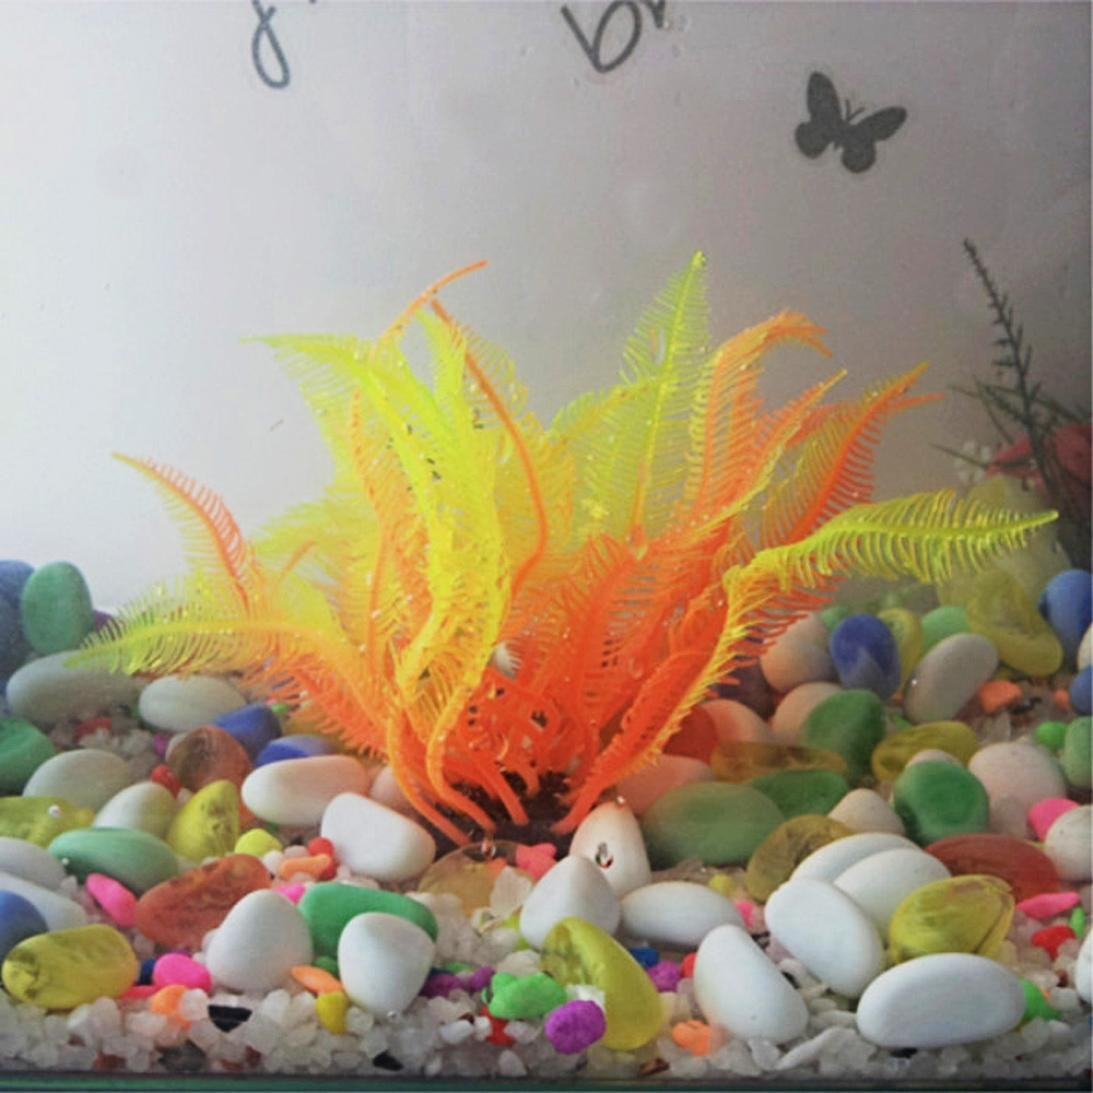 Amazon.com : Plastic Grass Artificial Plants Aquarium Fish Tank Decor Decoration Aquarium : Pet Supplies